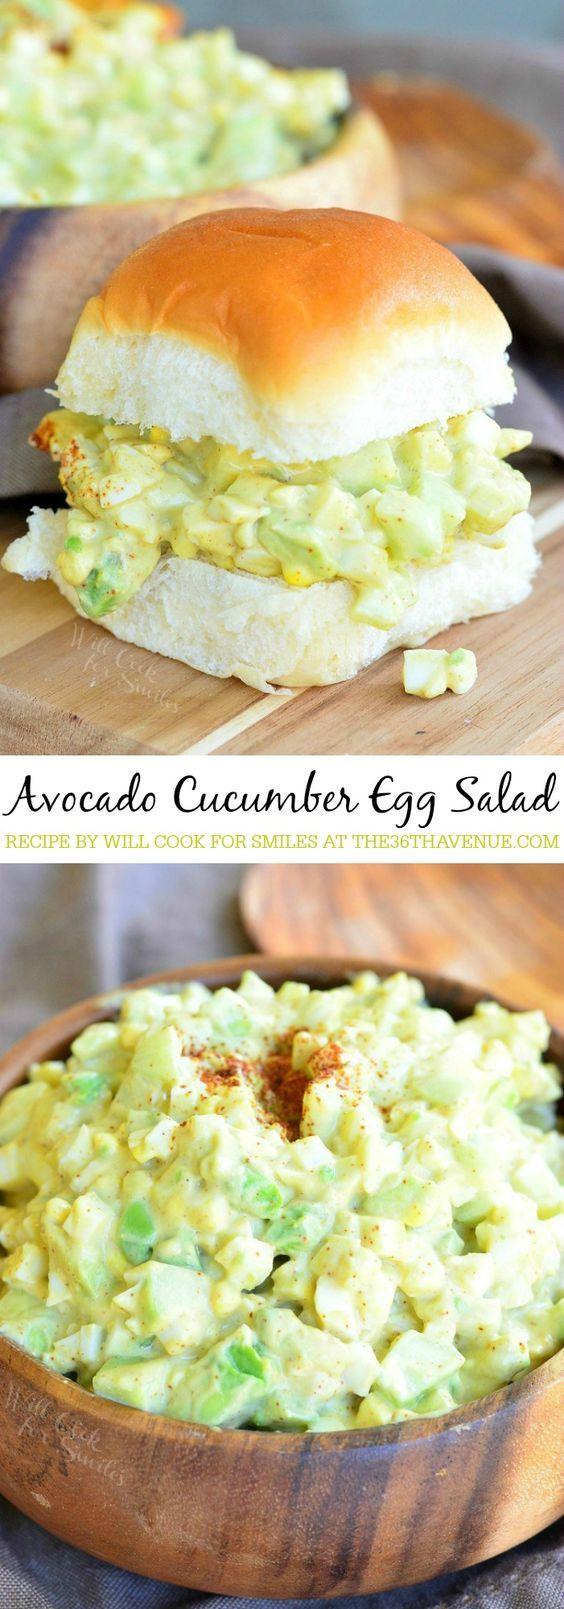 Avocado Cucumber Egg Salad | The 36th AVENUE | Bloglovin'